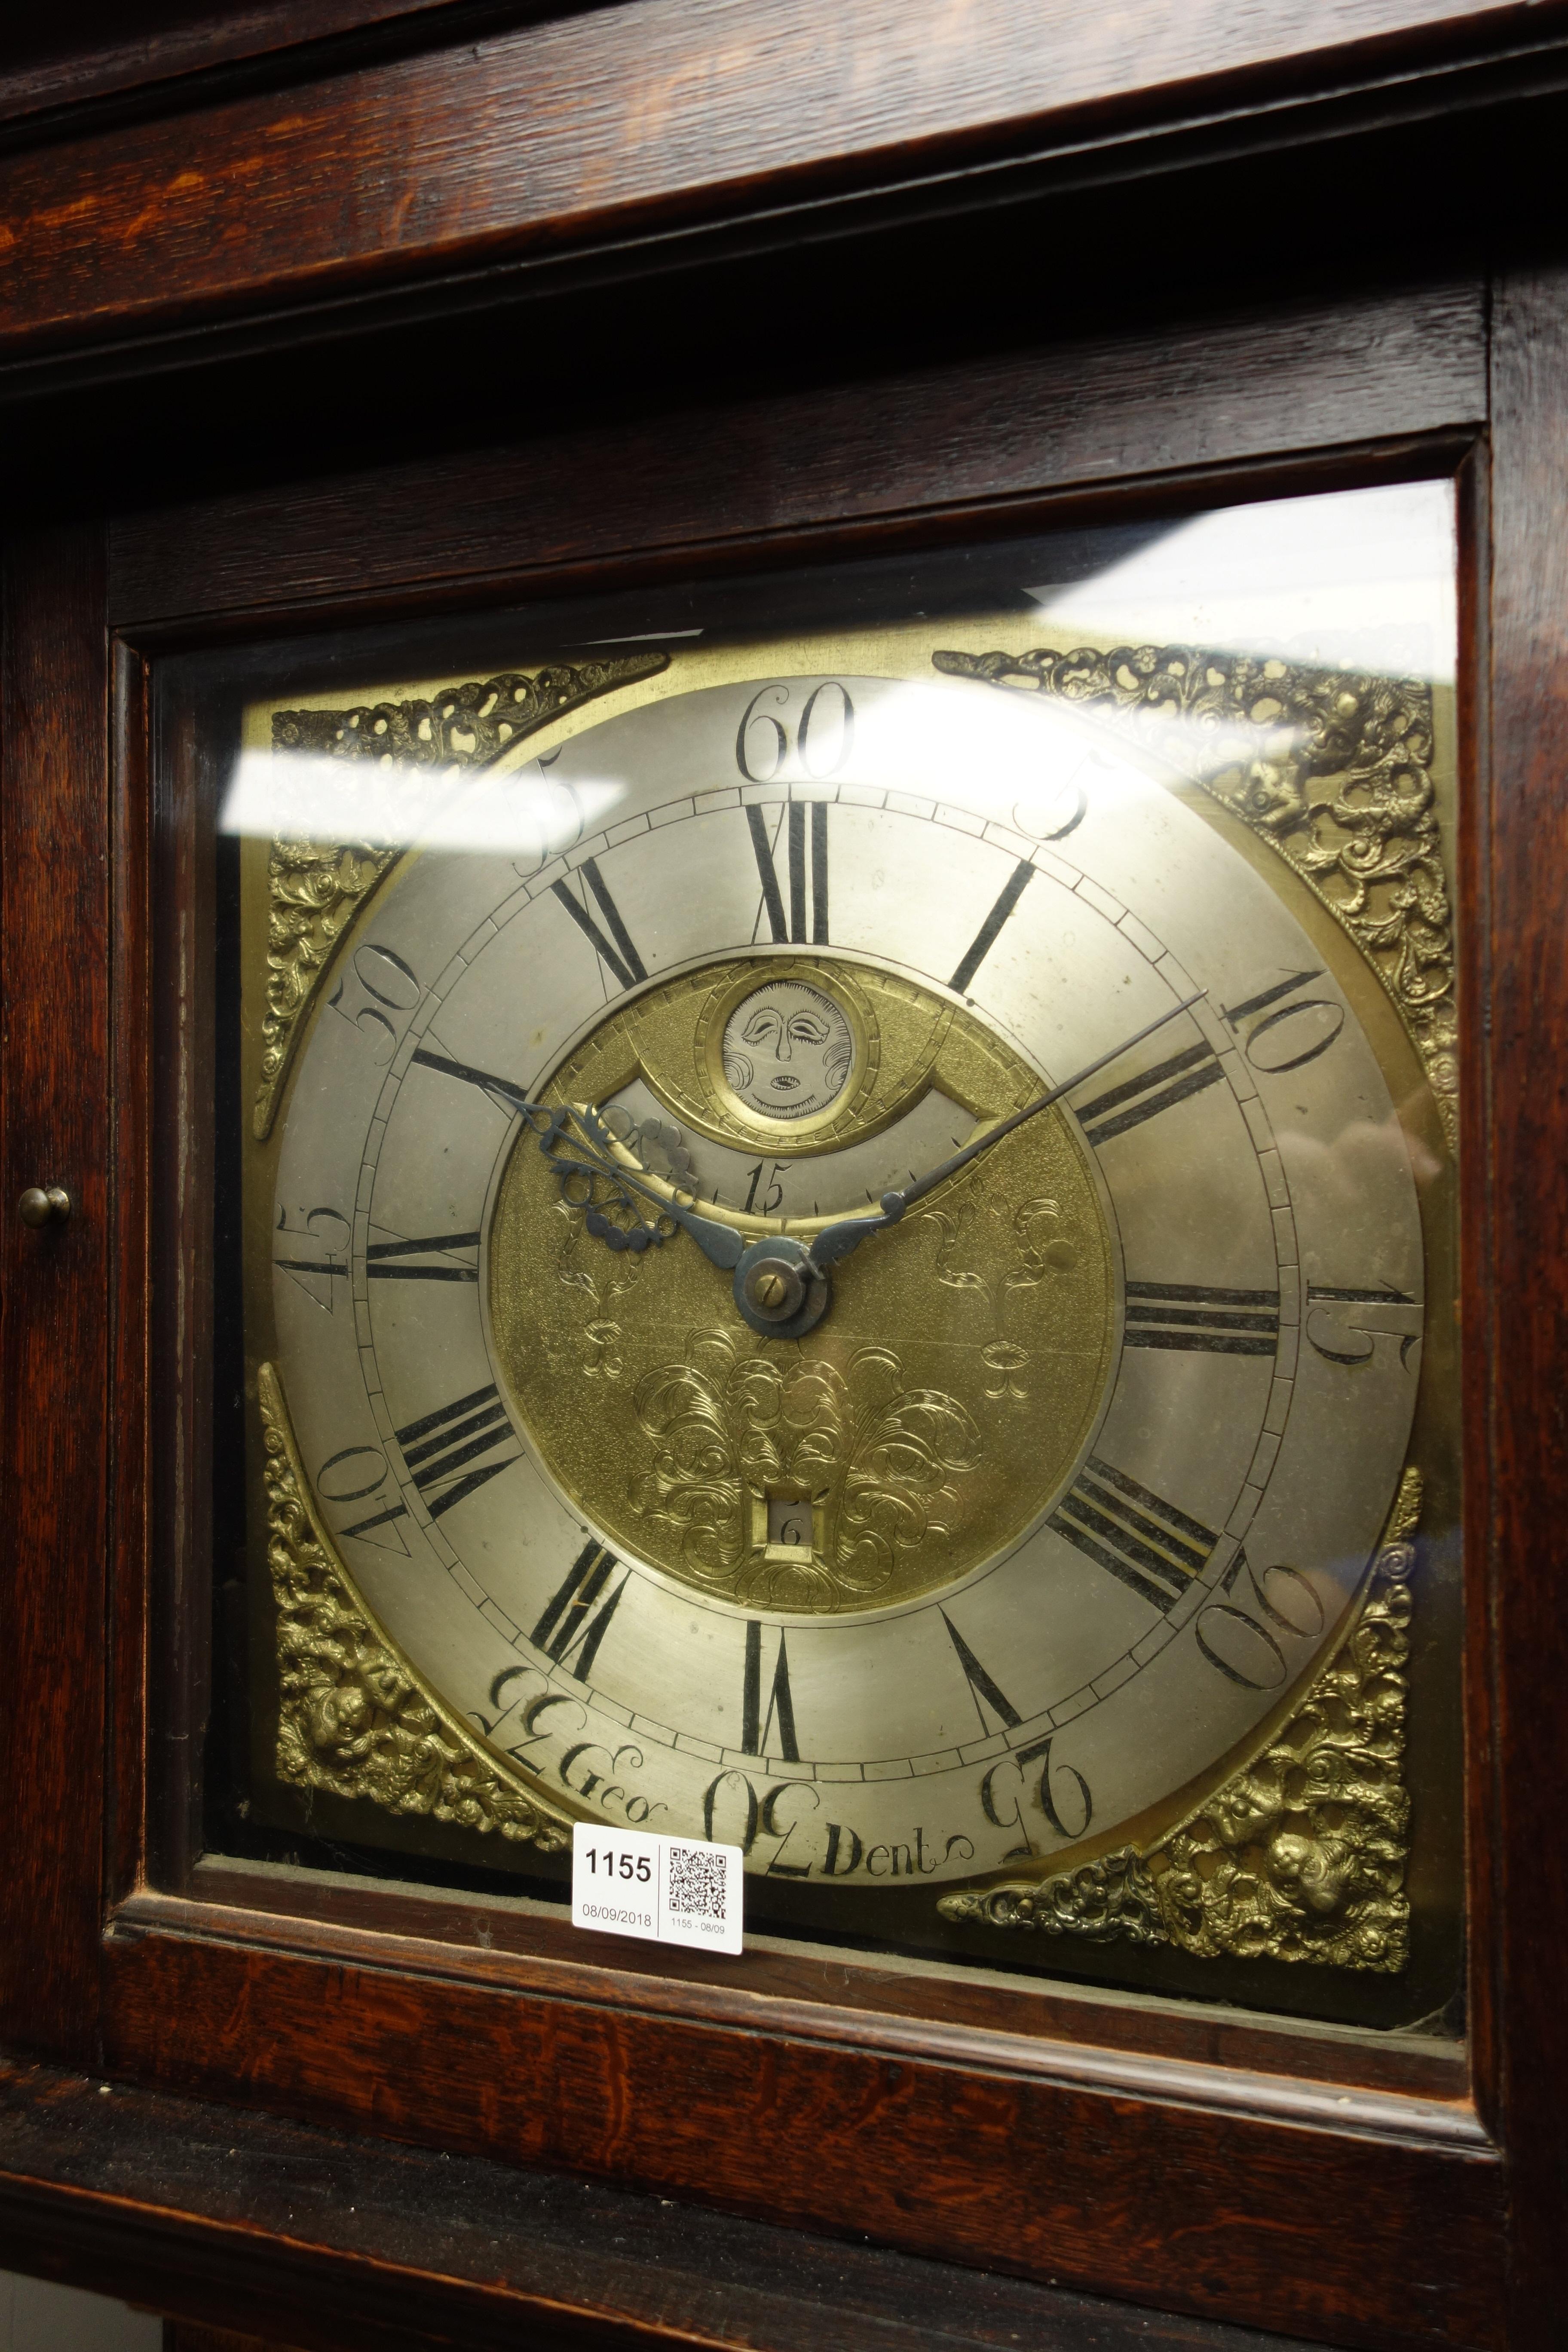 Lot 1155 - 19th century oak longcase clock, square brass dial inscribeed Geo.